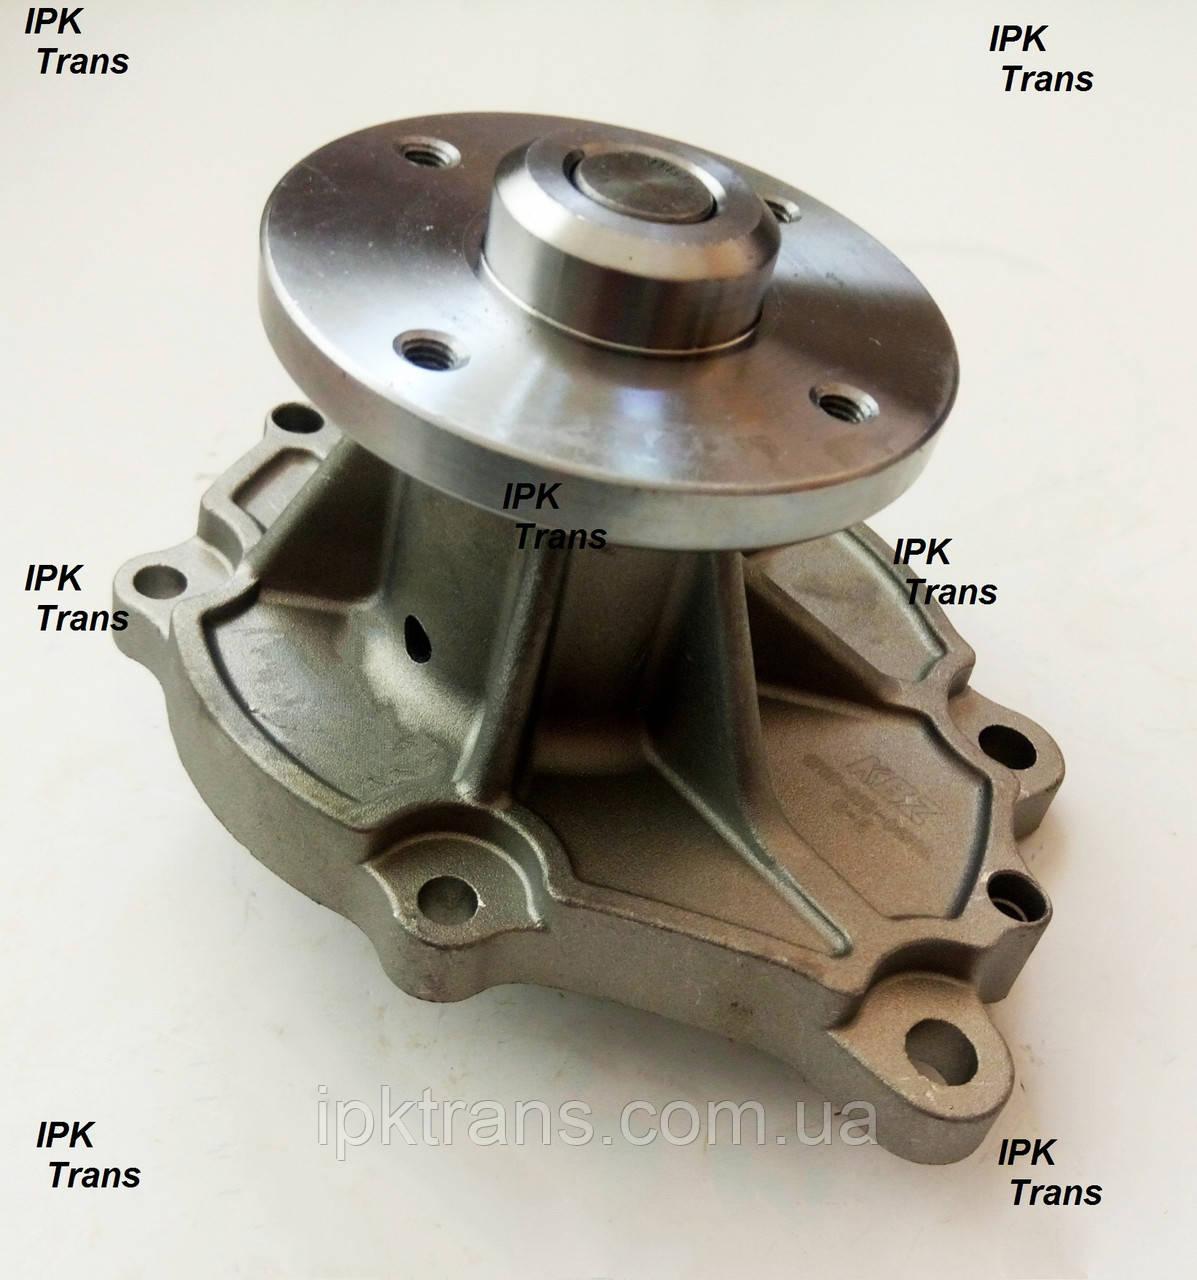 Помпа на двигатель NISSAN H20 (950 грн) 21010-50K26 / 2101050K26